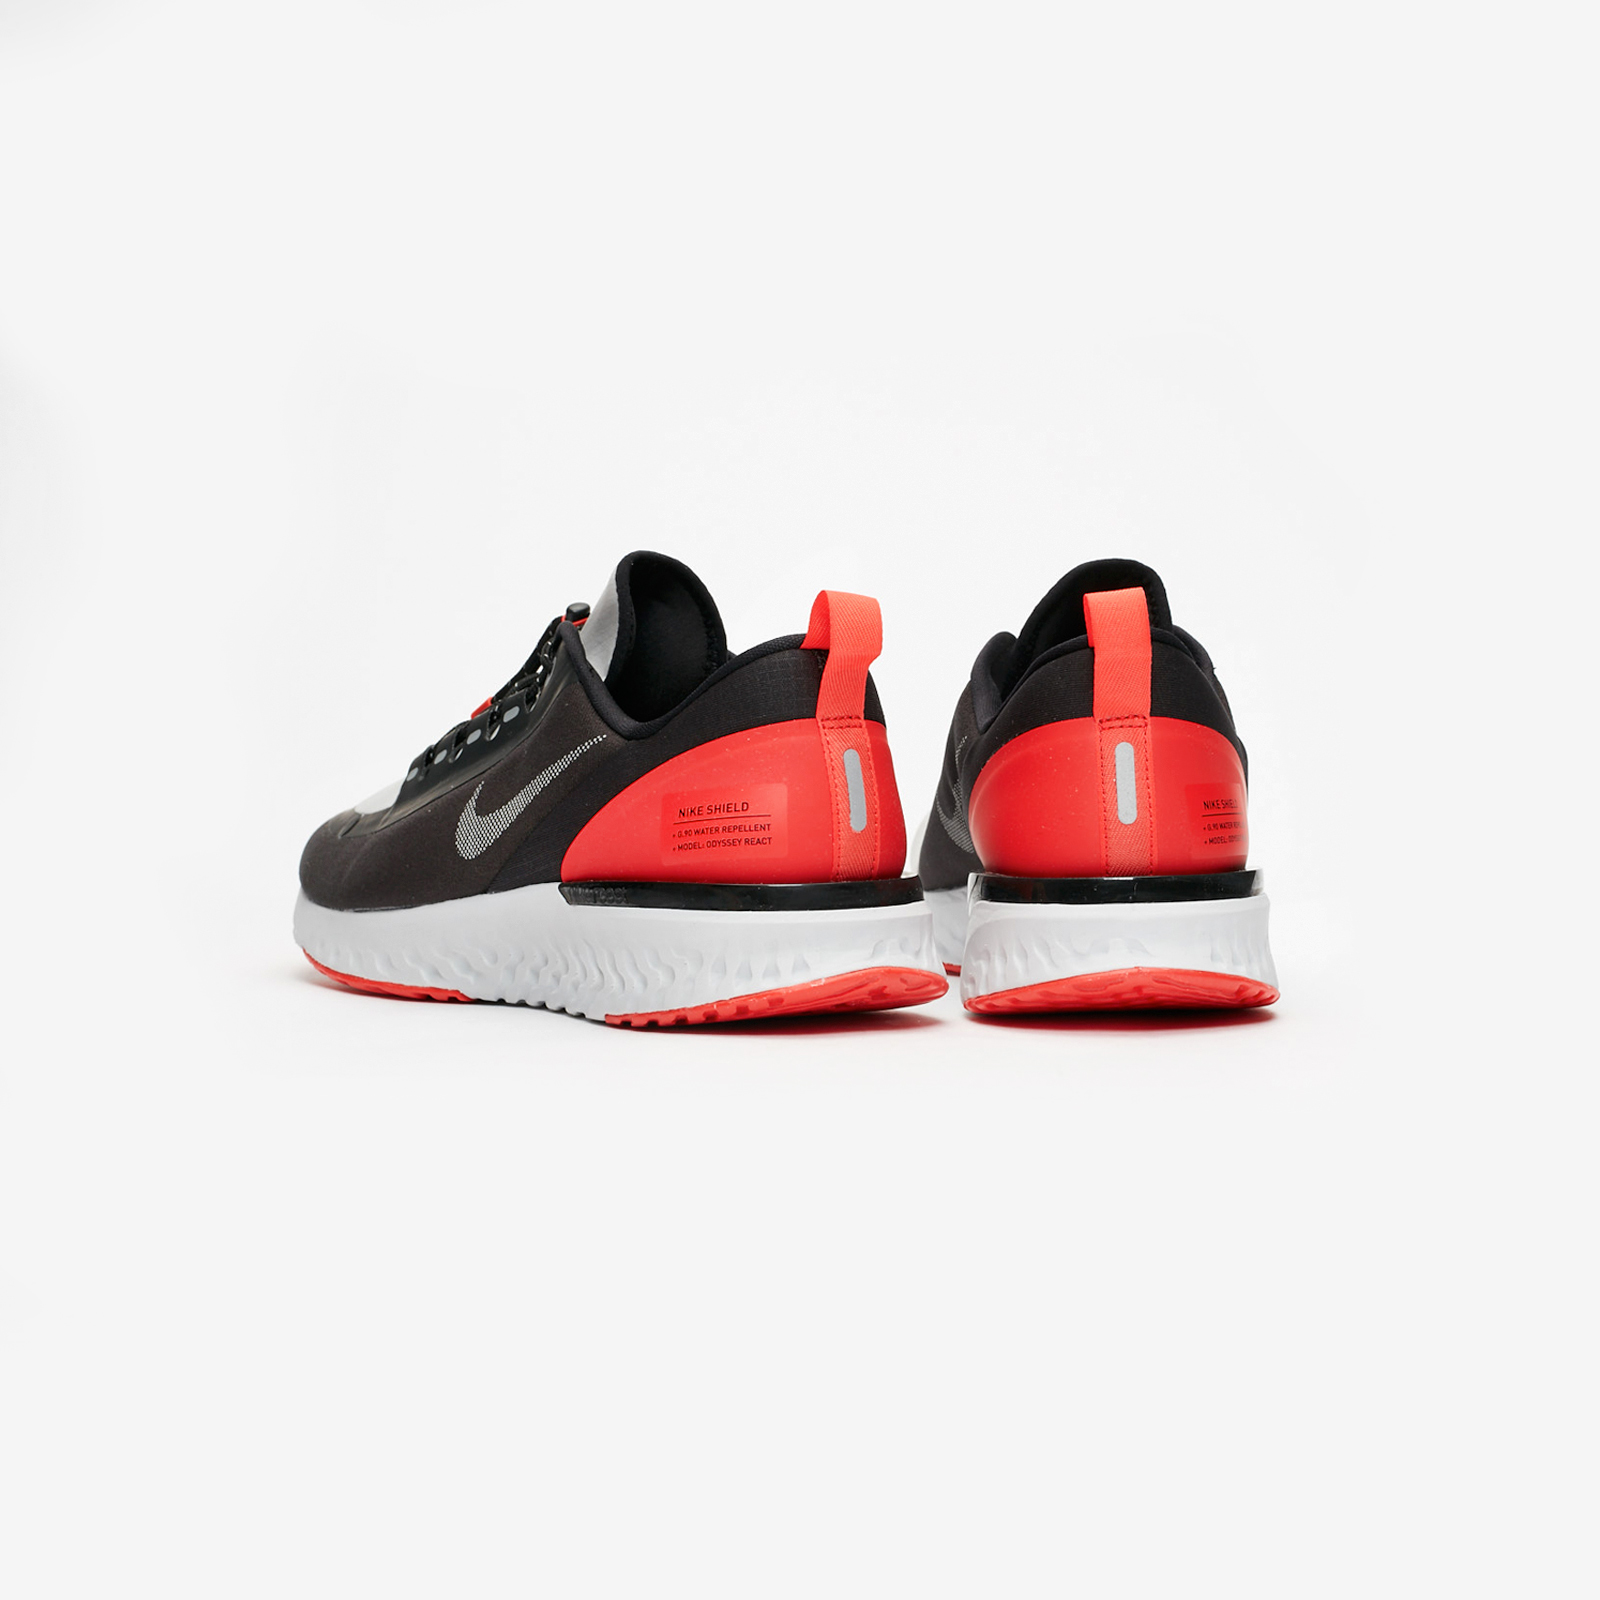 size 40 3d0d8 4eb88 Nike Odyssey React Shield QS - Bq9780-006 - Sneakersnstuff ...